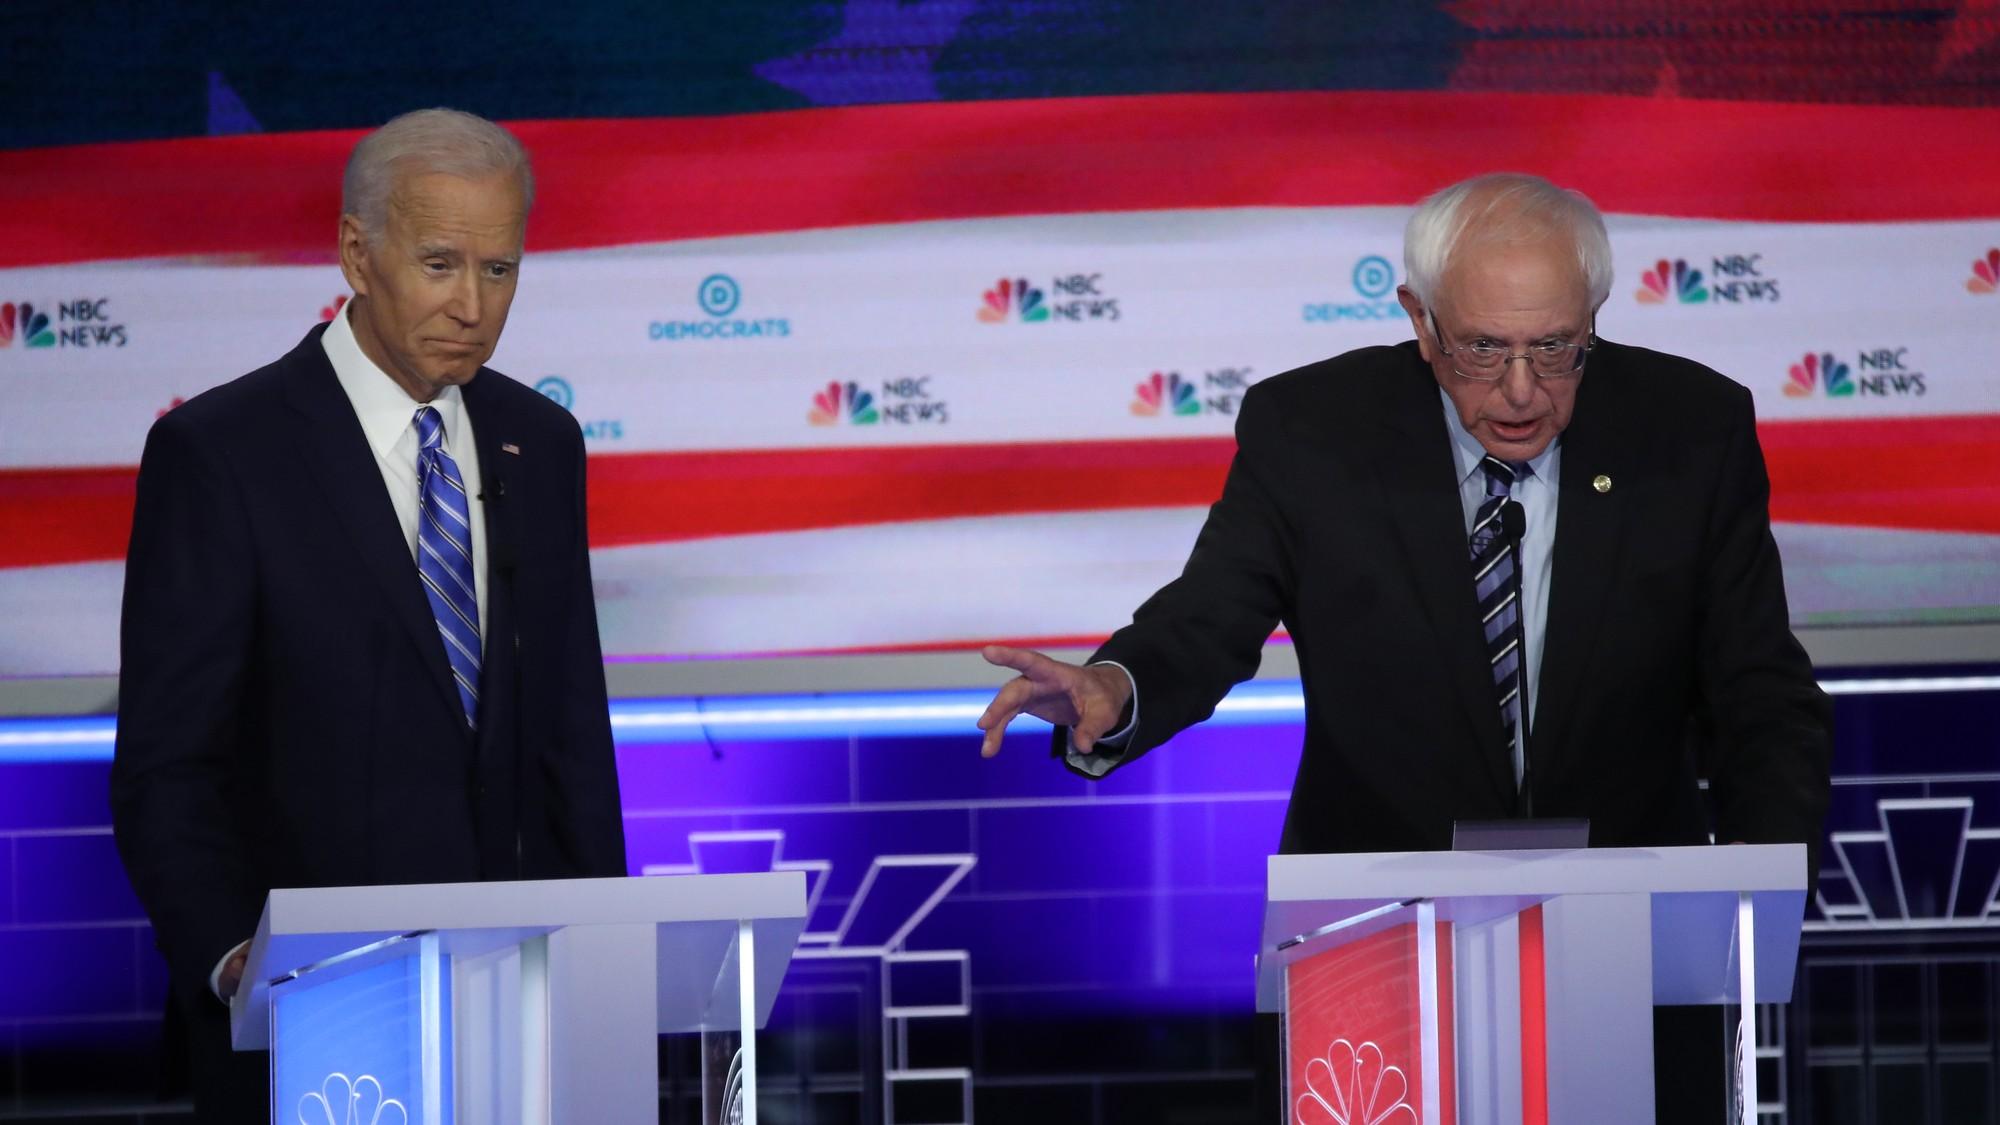 9 Legitimately Weird Moments from Thursday's Democratic